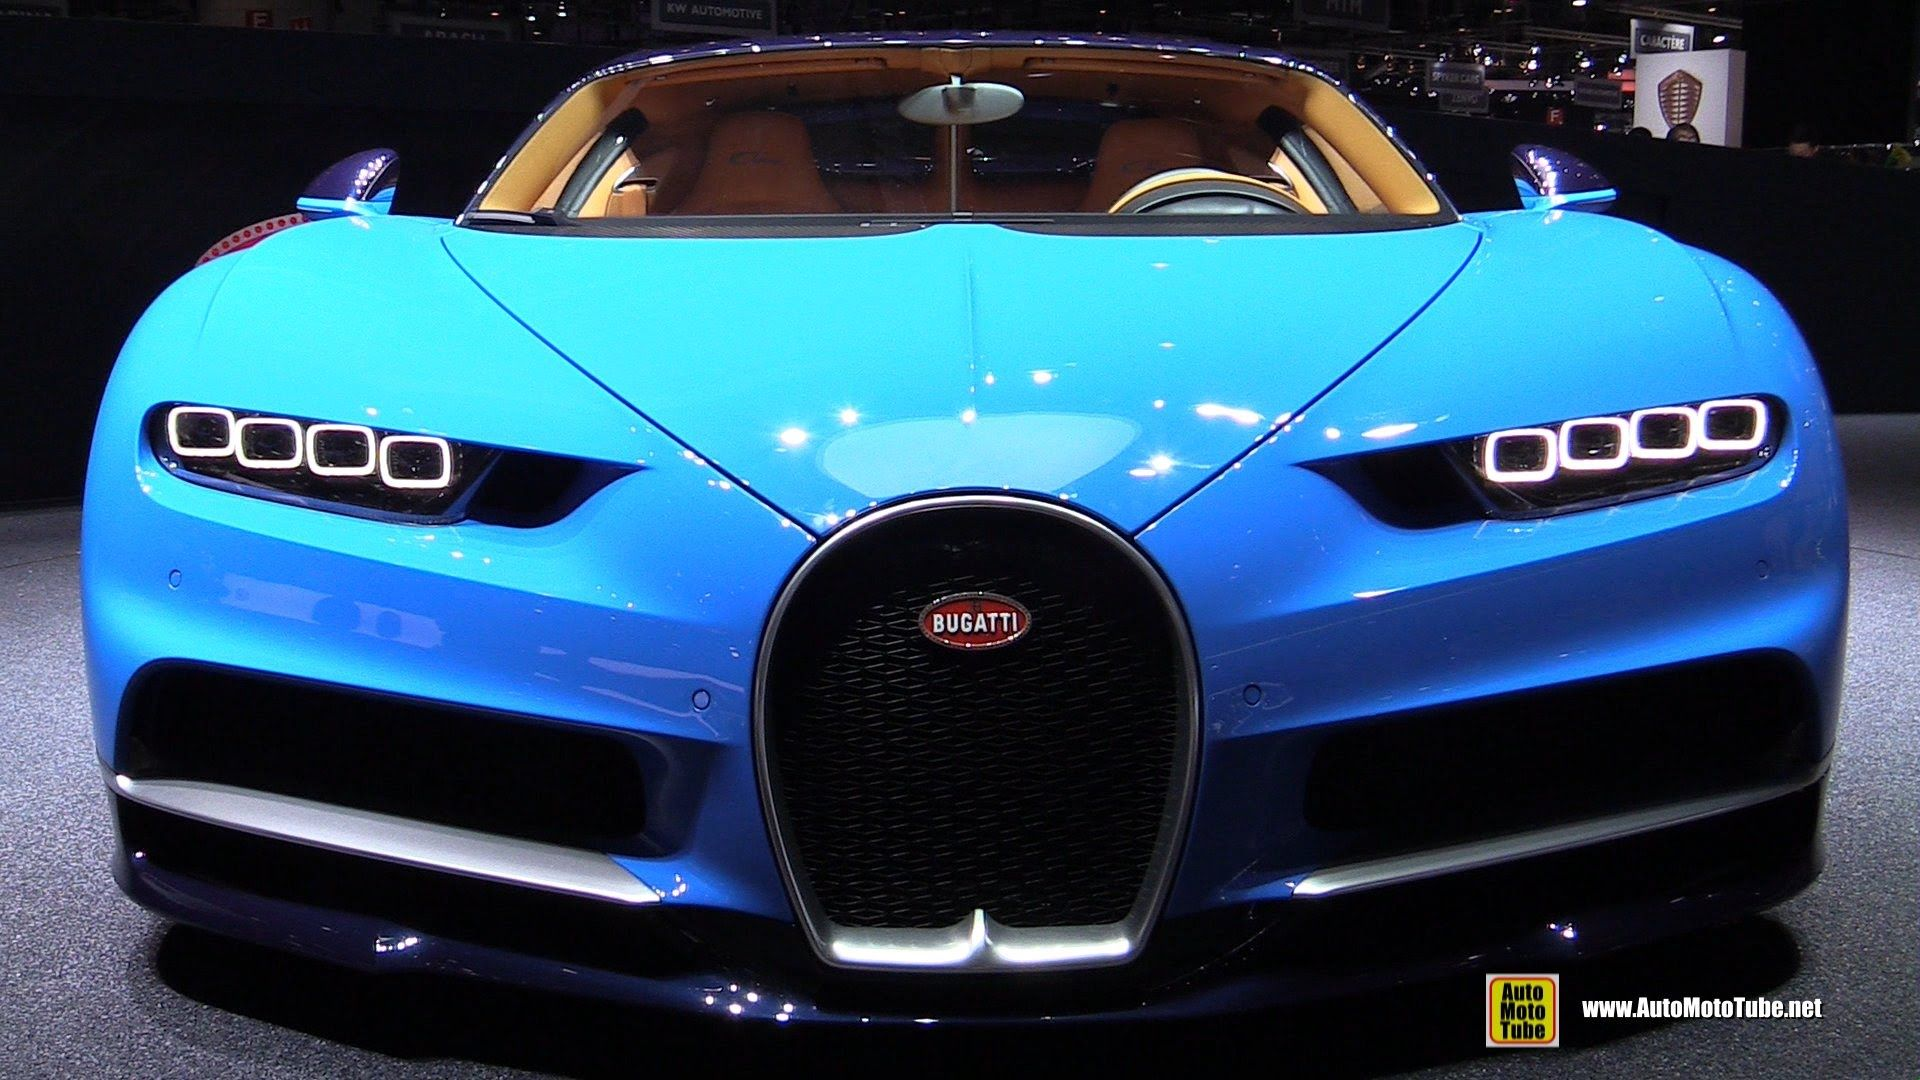 Bugatti Chiron Quick View Debut At Geneva Motor Show